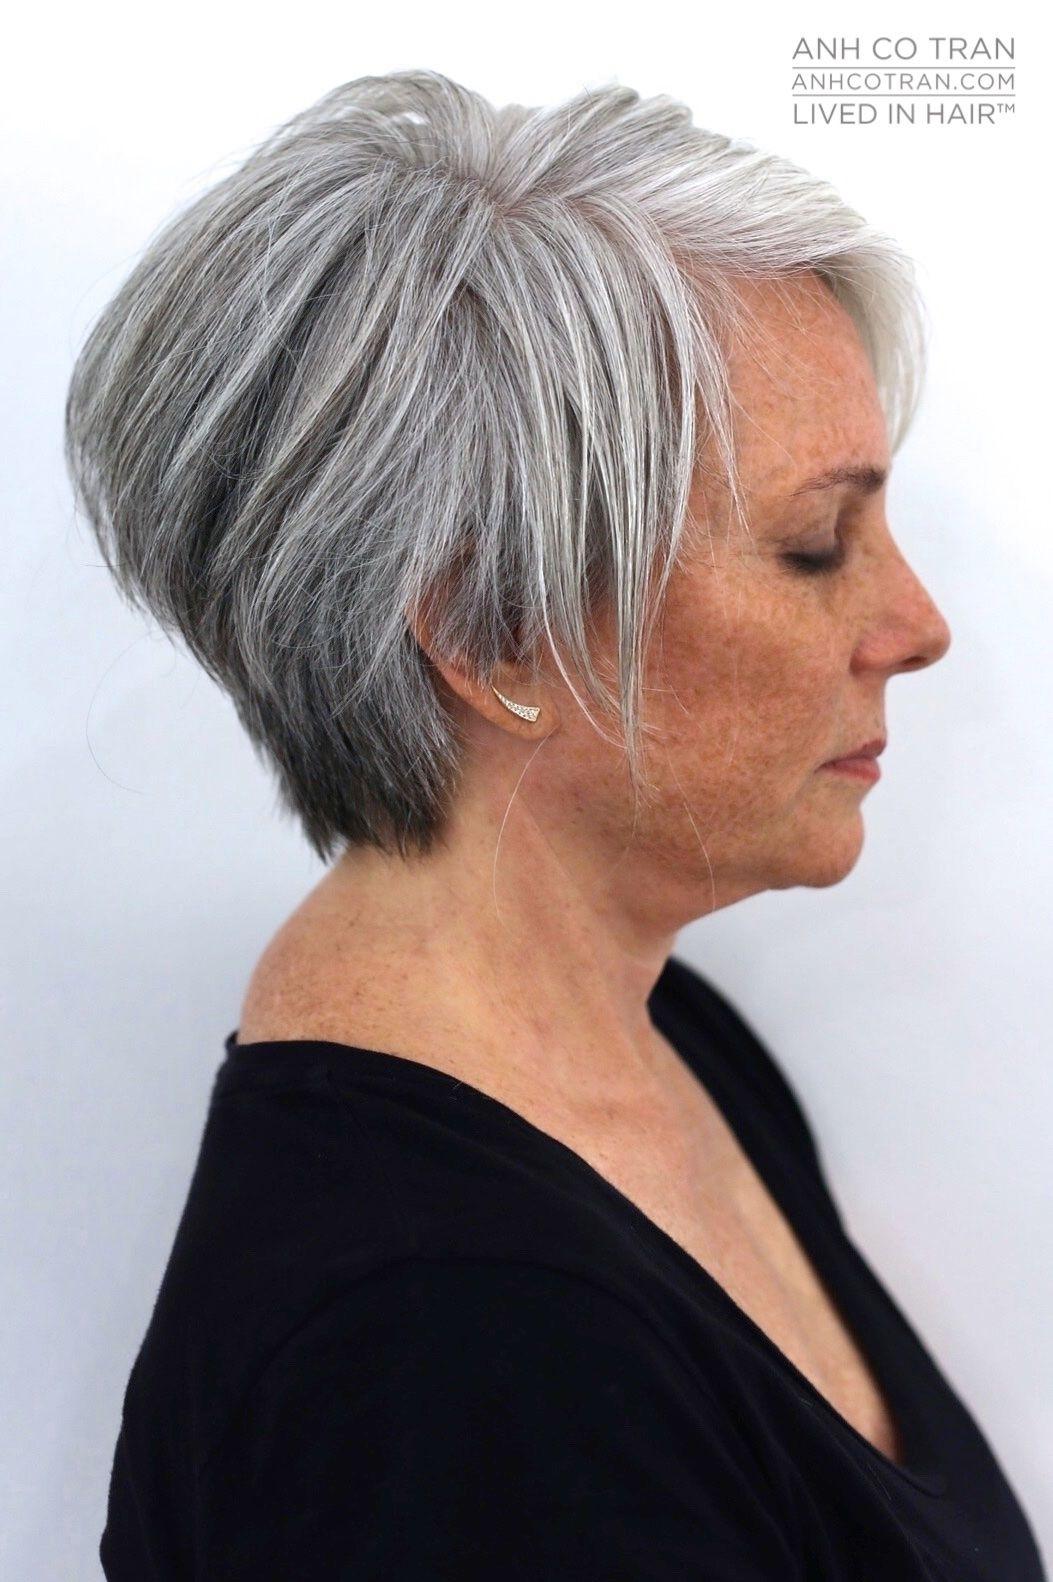 Anh Co Tran | Gray Hair In 2019 | Short Grey Hair, Short Hair Styles in 2019 Gray Hair Short